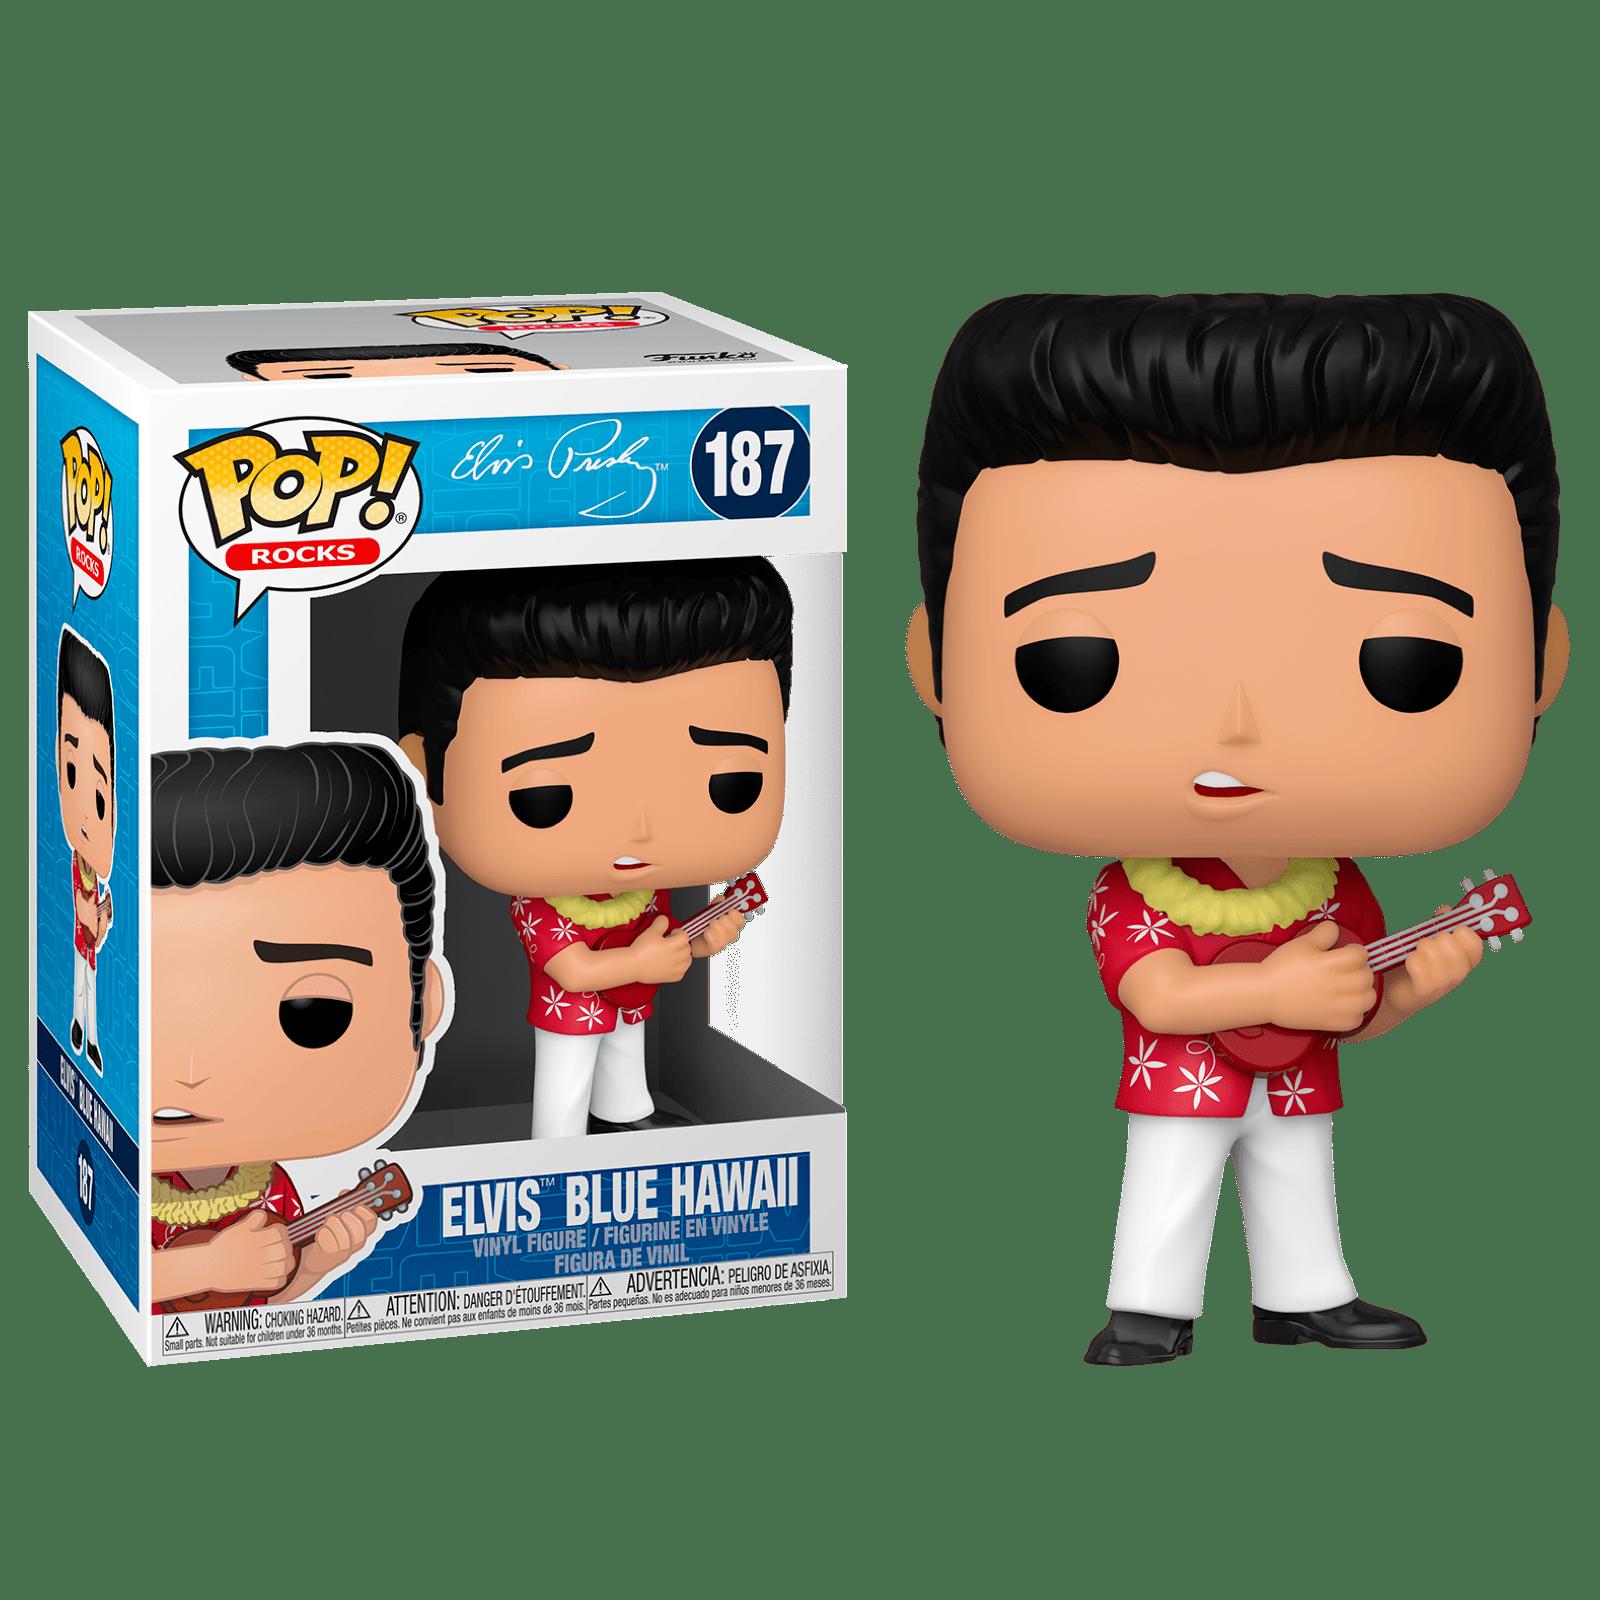 Фигурка Фанко ПОП Элвис Пресли Голубые Гавайи (Elvis Presley Blue Hawaii) из серии Музыканты